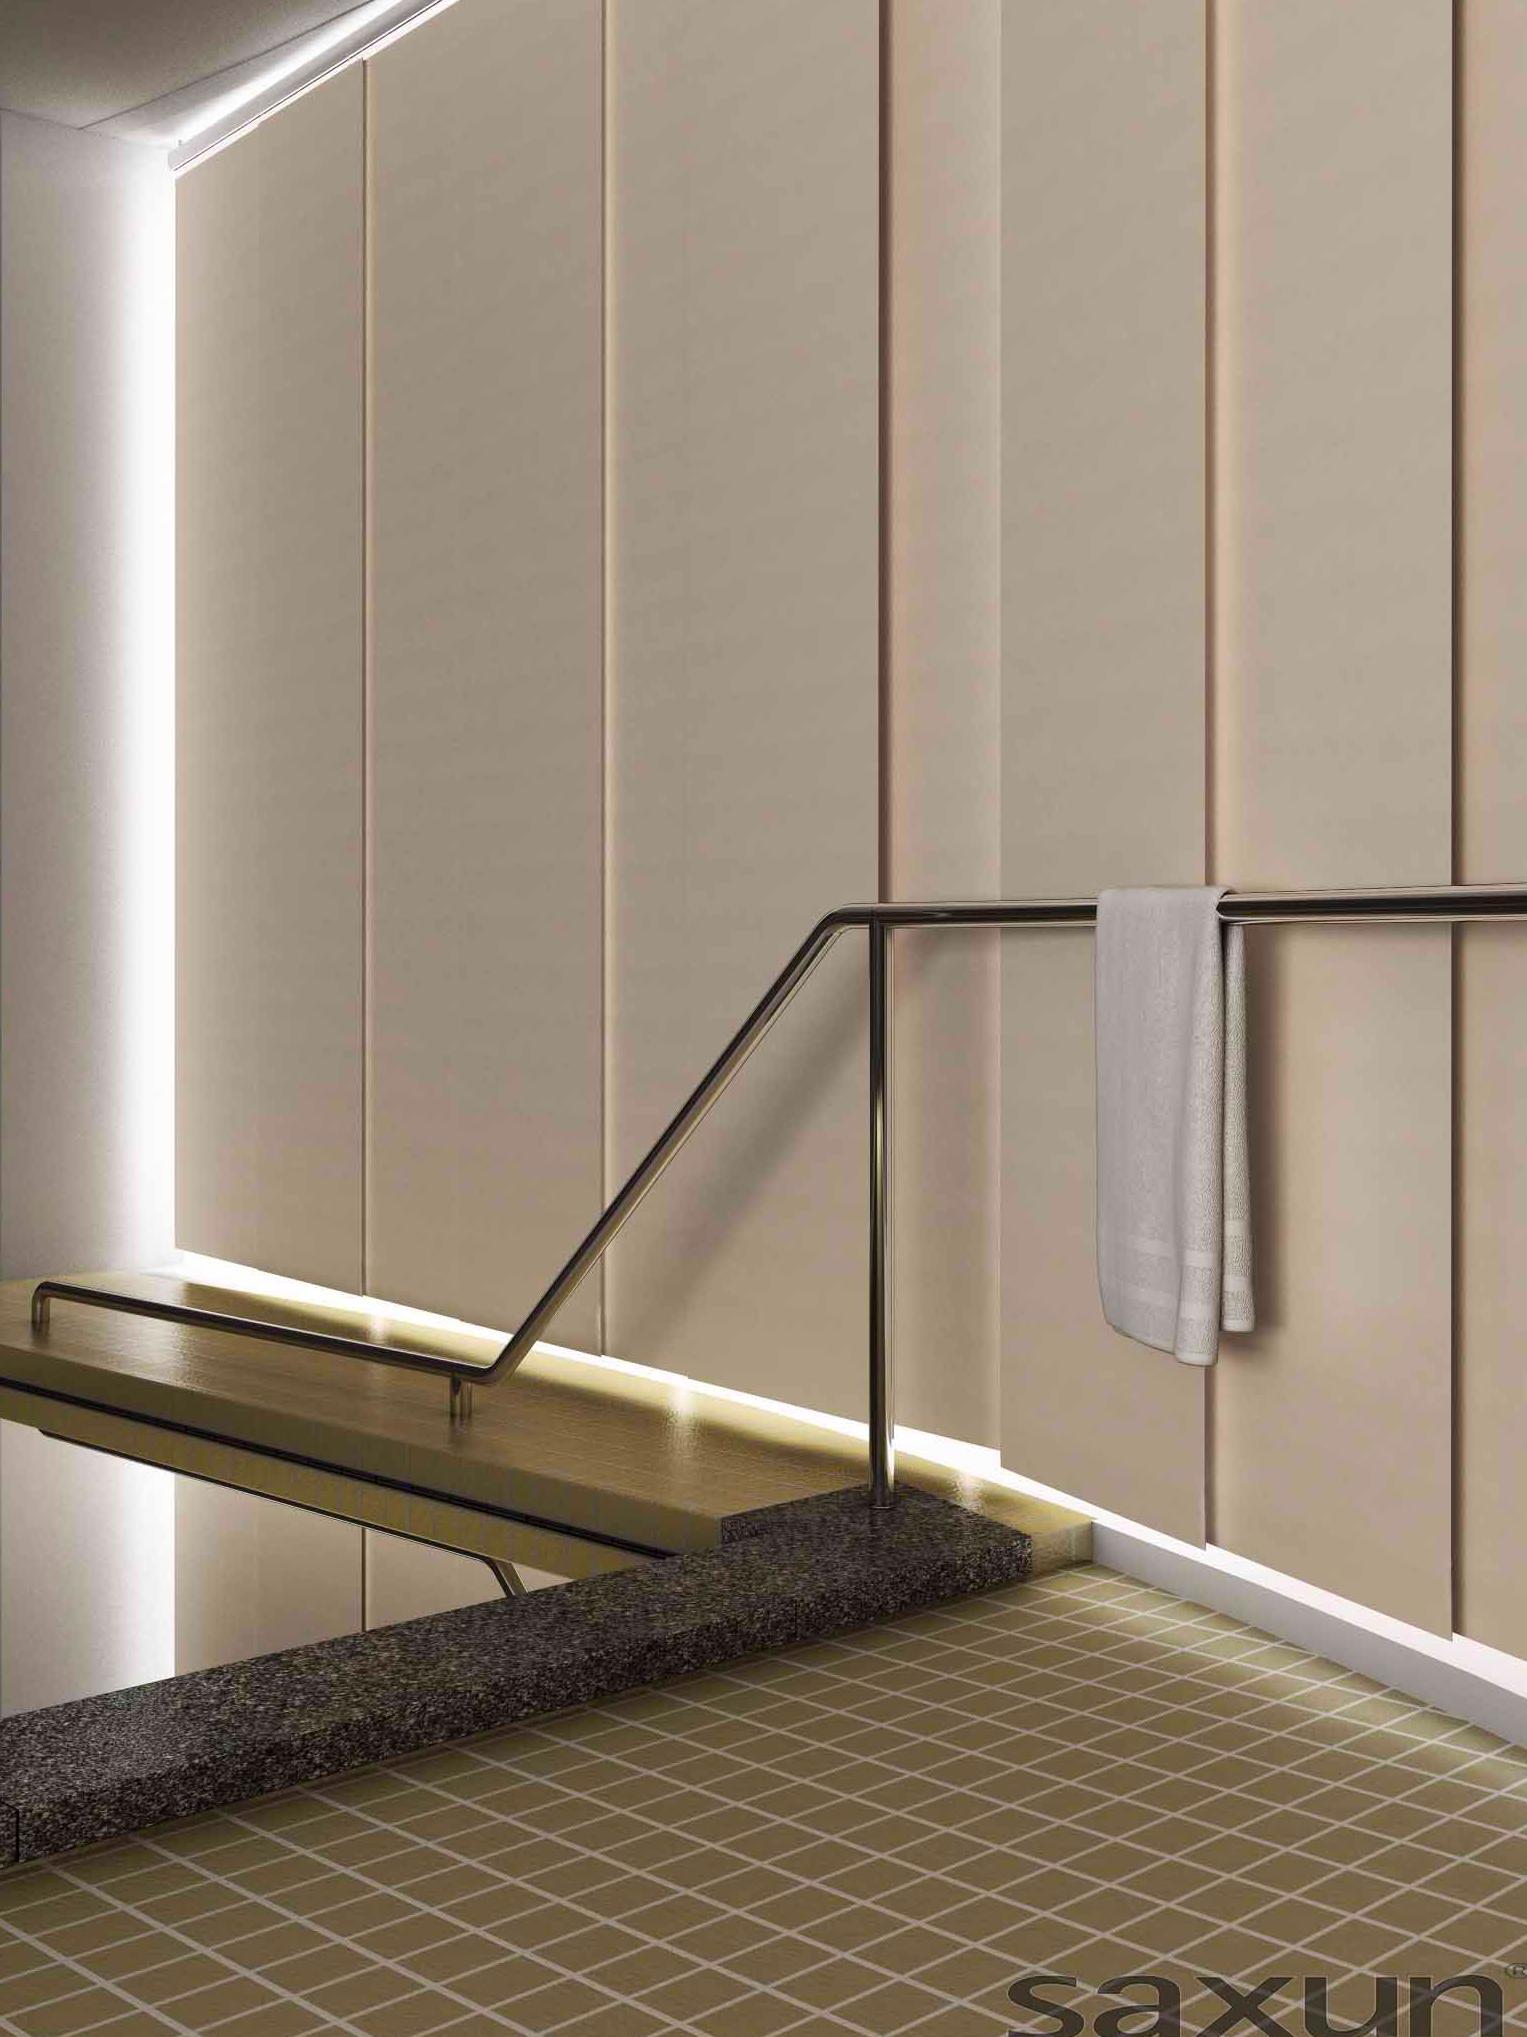 Paneles japoneses cat logo de cortinas y estores de decotex siglo xxi - Paneles japoneses en madrid ...